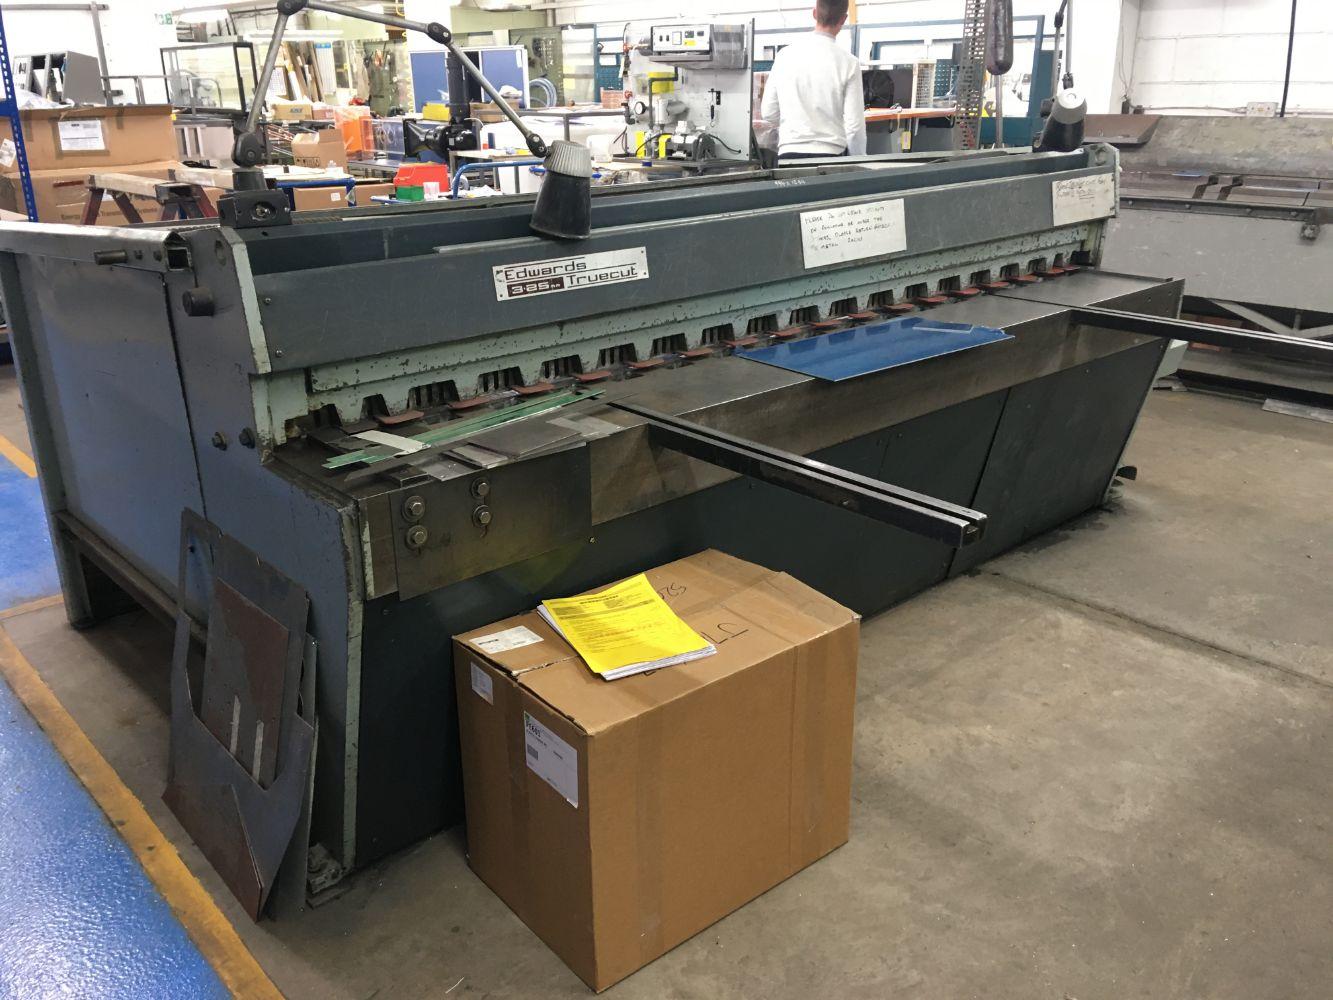 Machine Tools & Sheet Metal Working Equipment, Panel Van and Overhead Crane (circa 500 lots)